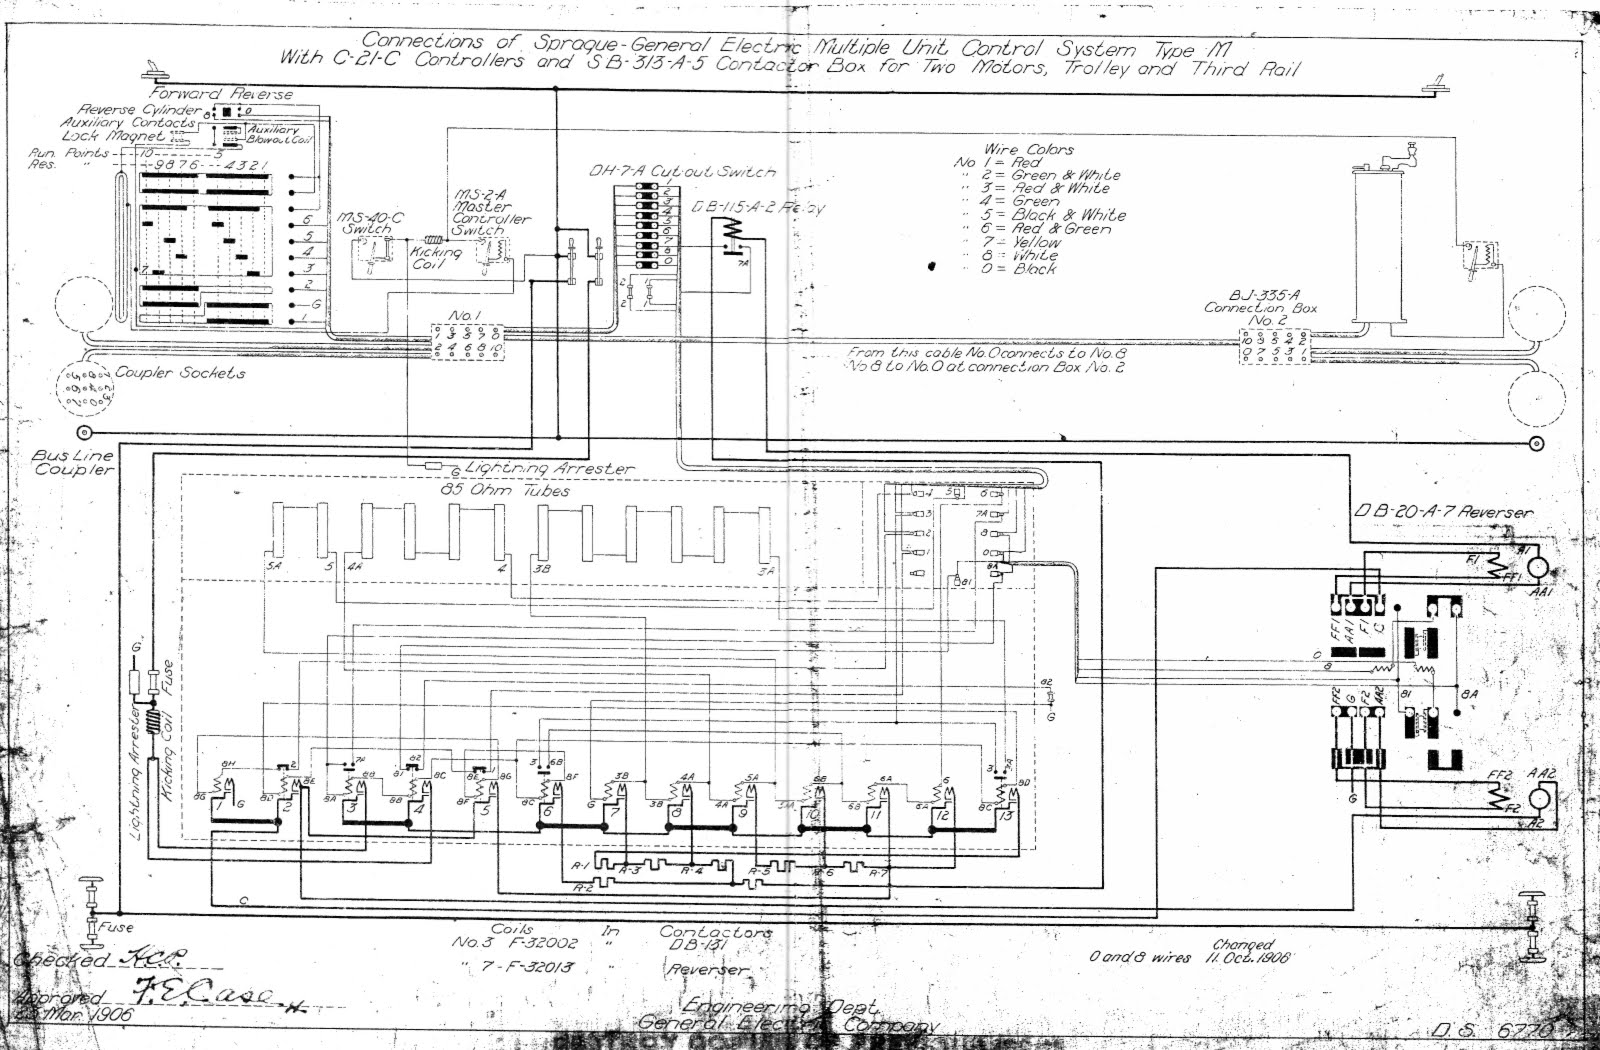 2000 Isuzu Ftr Tail Light Wiring Detailed Schematics Diagram Off Road Ford Npr Trusted